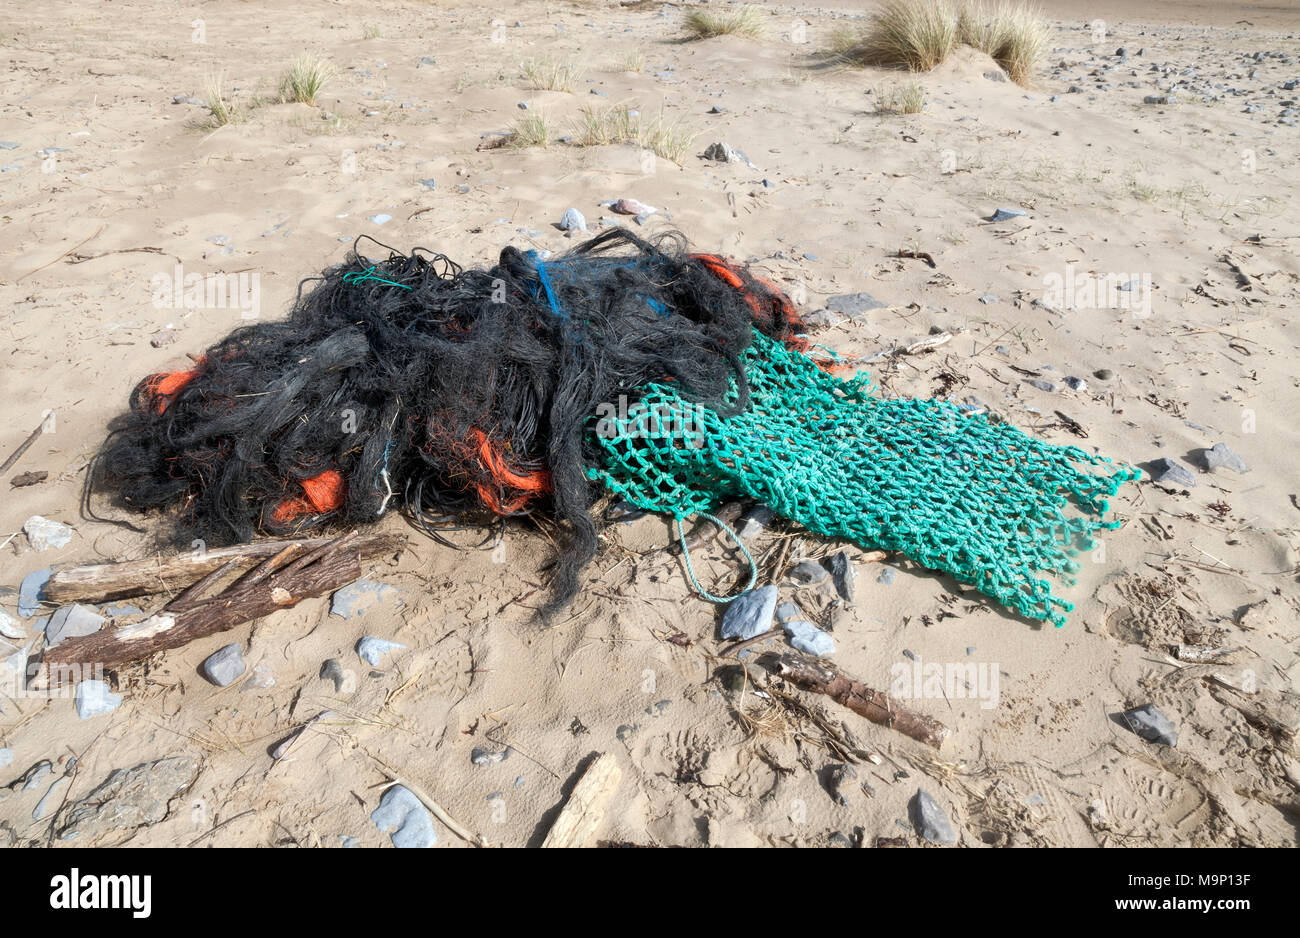 Marine debris - Stock Image